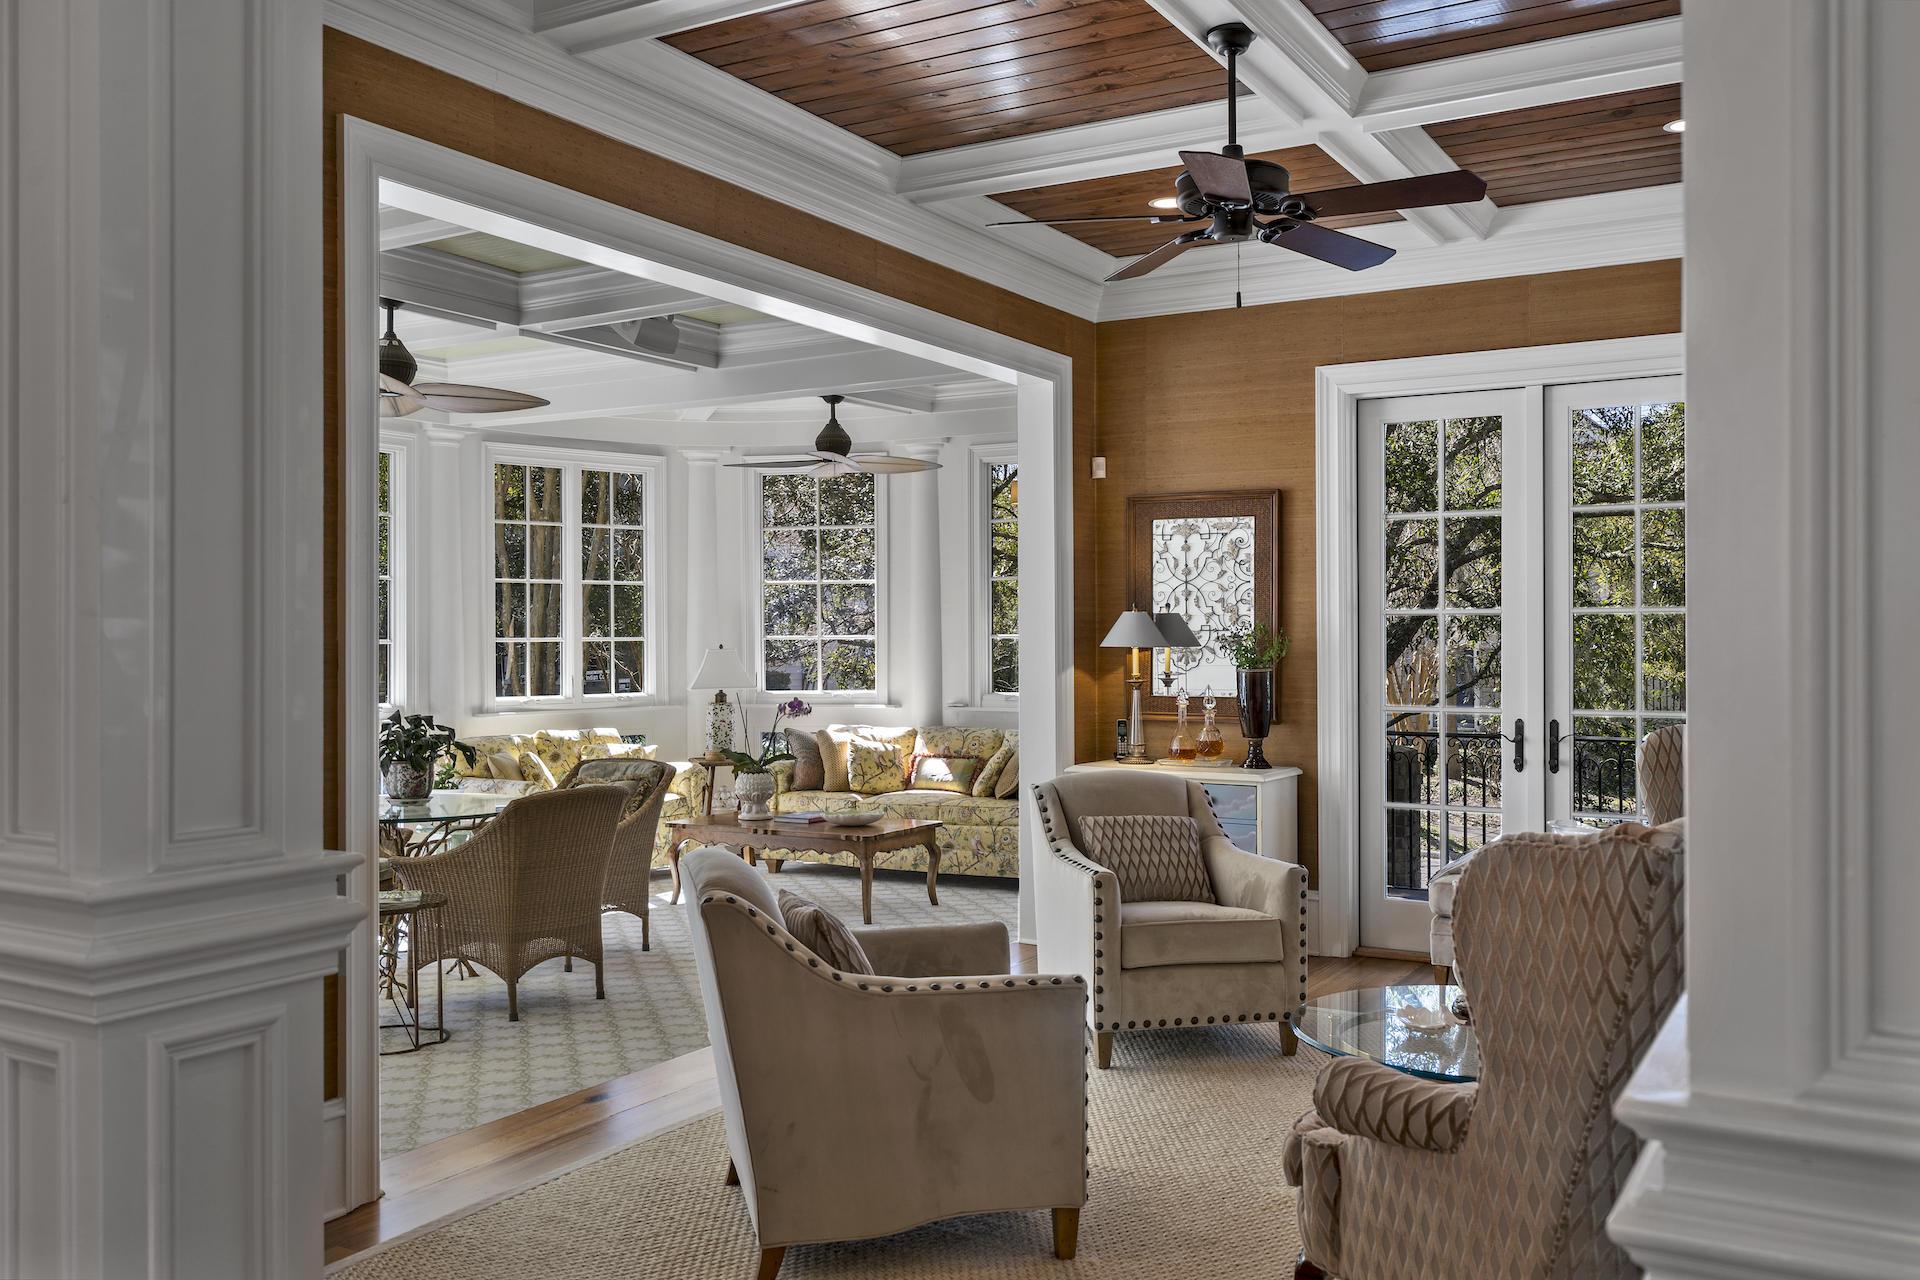 Daniel Island Homes For Sale - 623 Island Park, Charleston, SC - 41